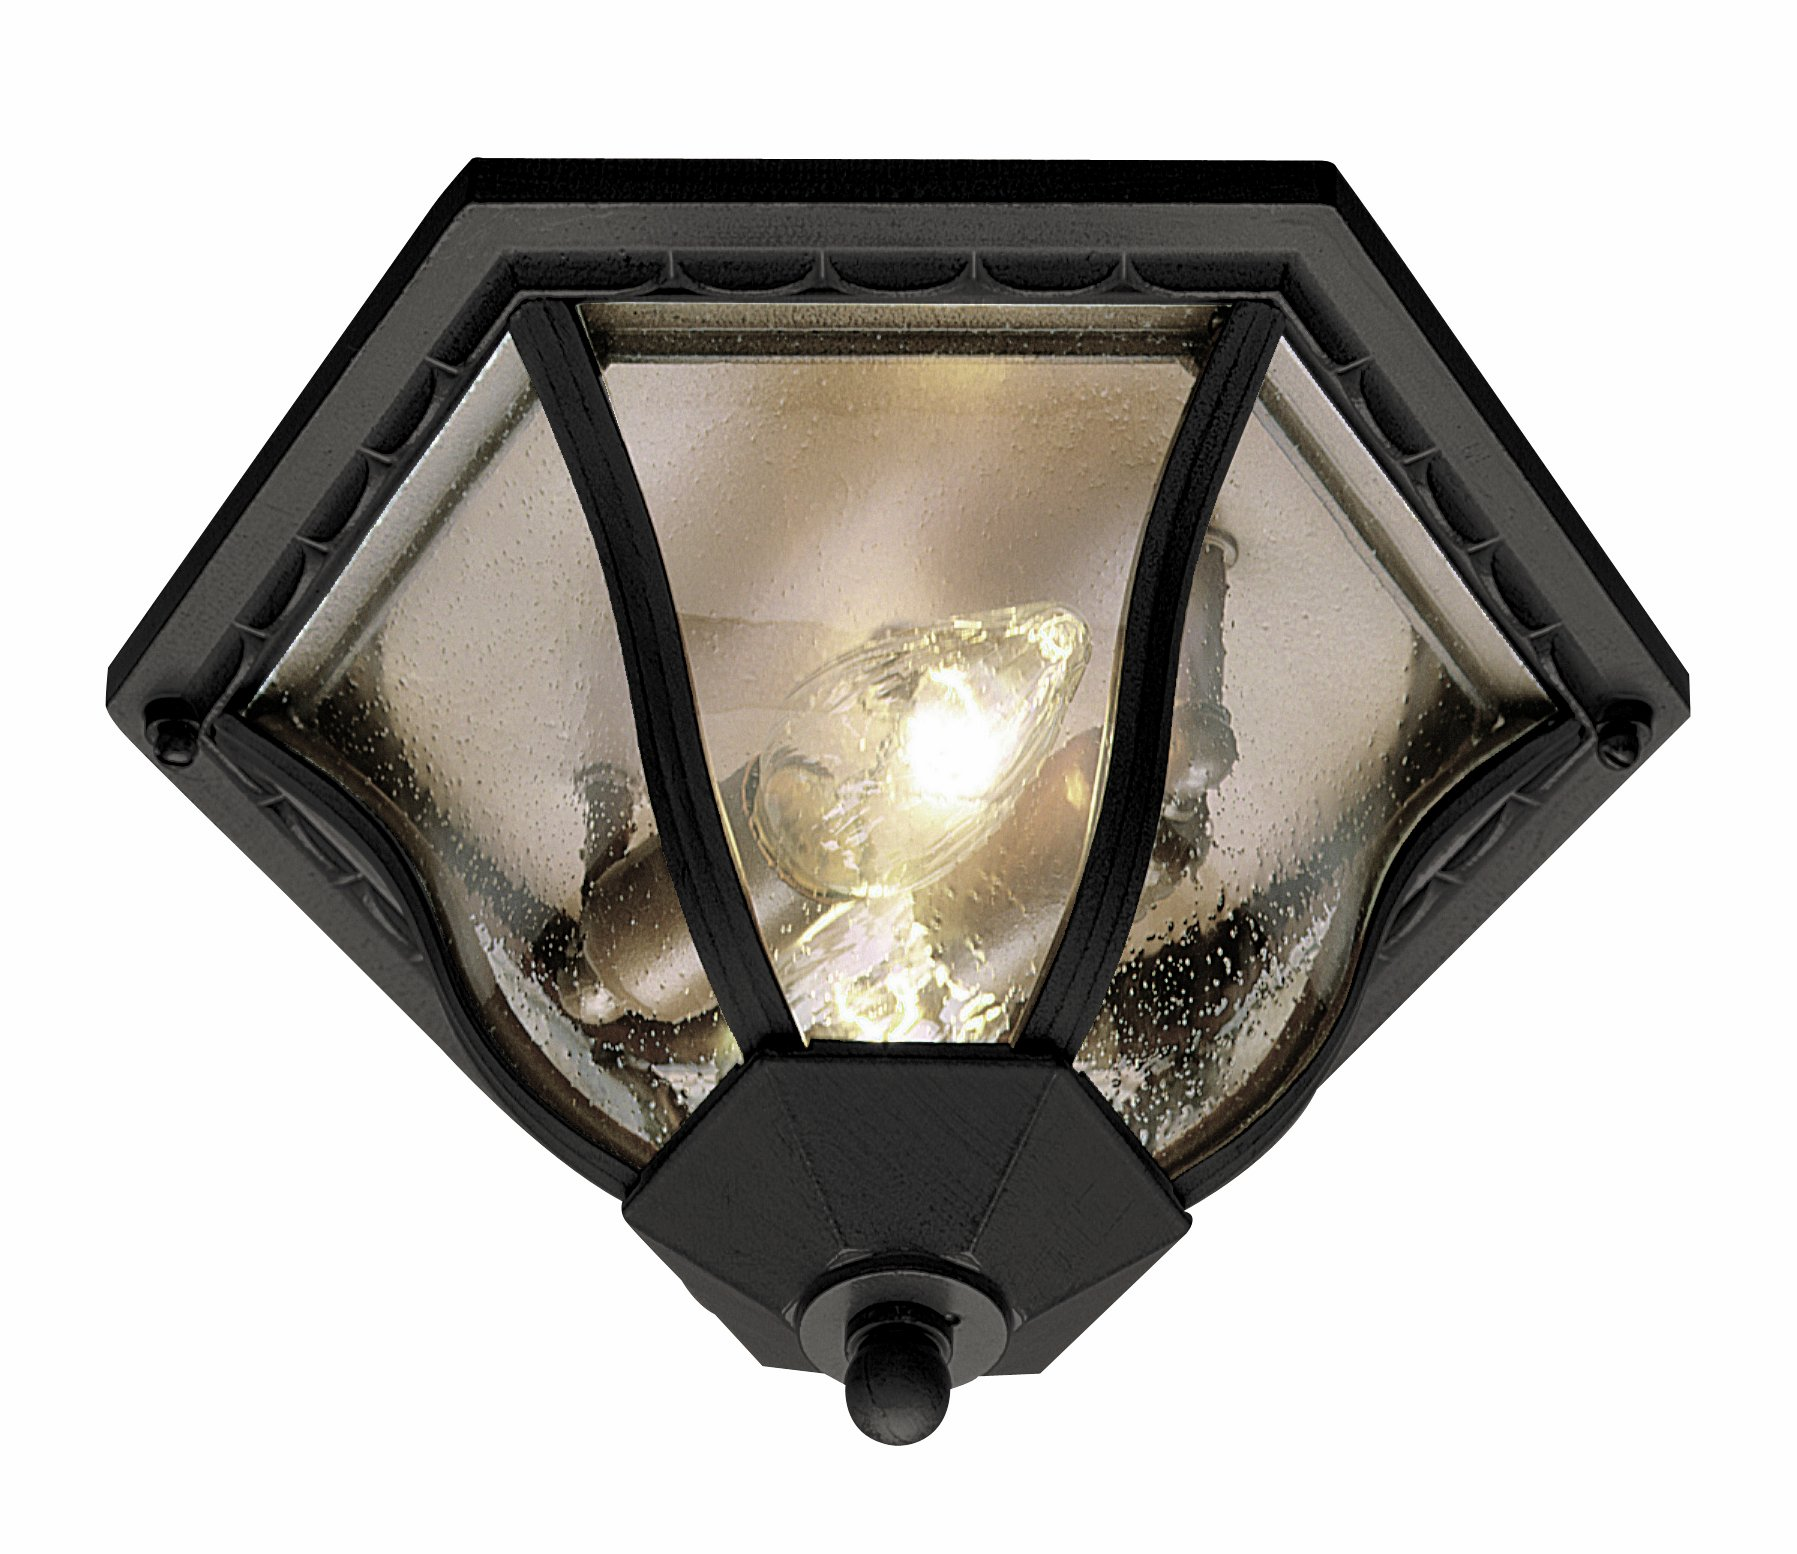 Trans Globe Lighting 4559 BC Outdoor Bostwick 8.5'' Flushmount Lantern, Black Copper by Trans Globe Lighting